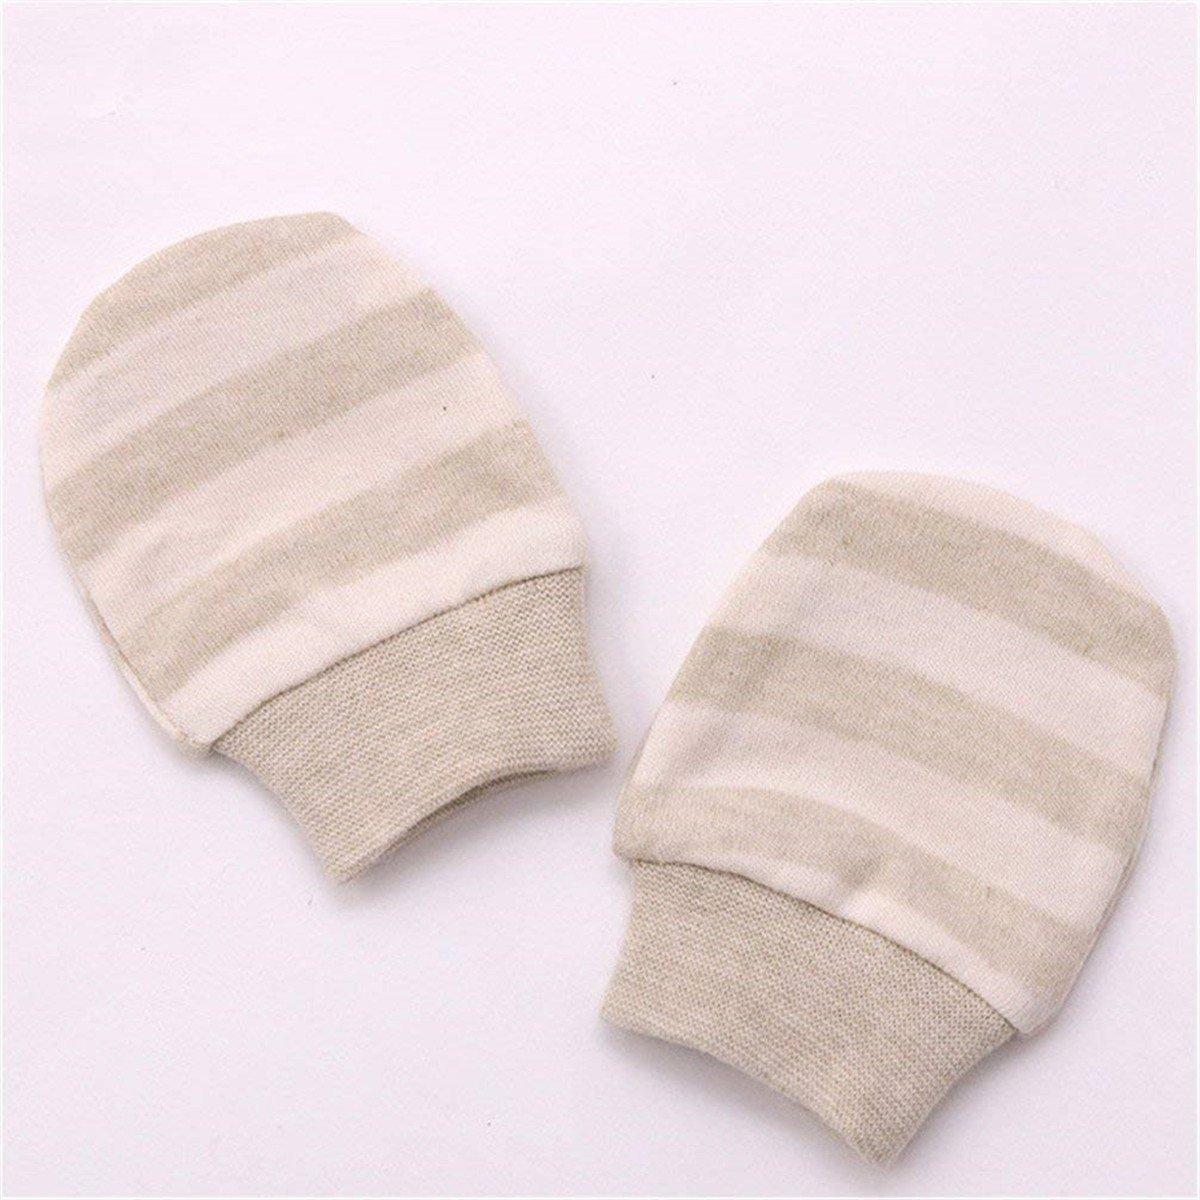 Affe 2/pares//lot beb/é ni/ña ni/ño oto/ño//invierno espesada calentador guantes manoplas antiara/ñazos para reci/én nacido